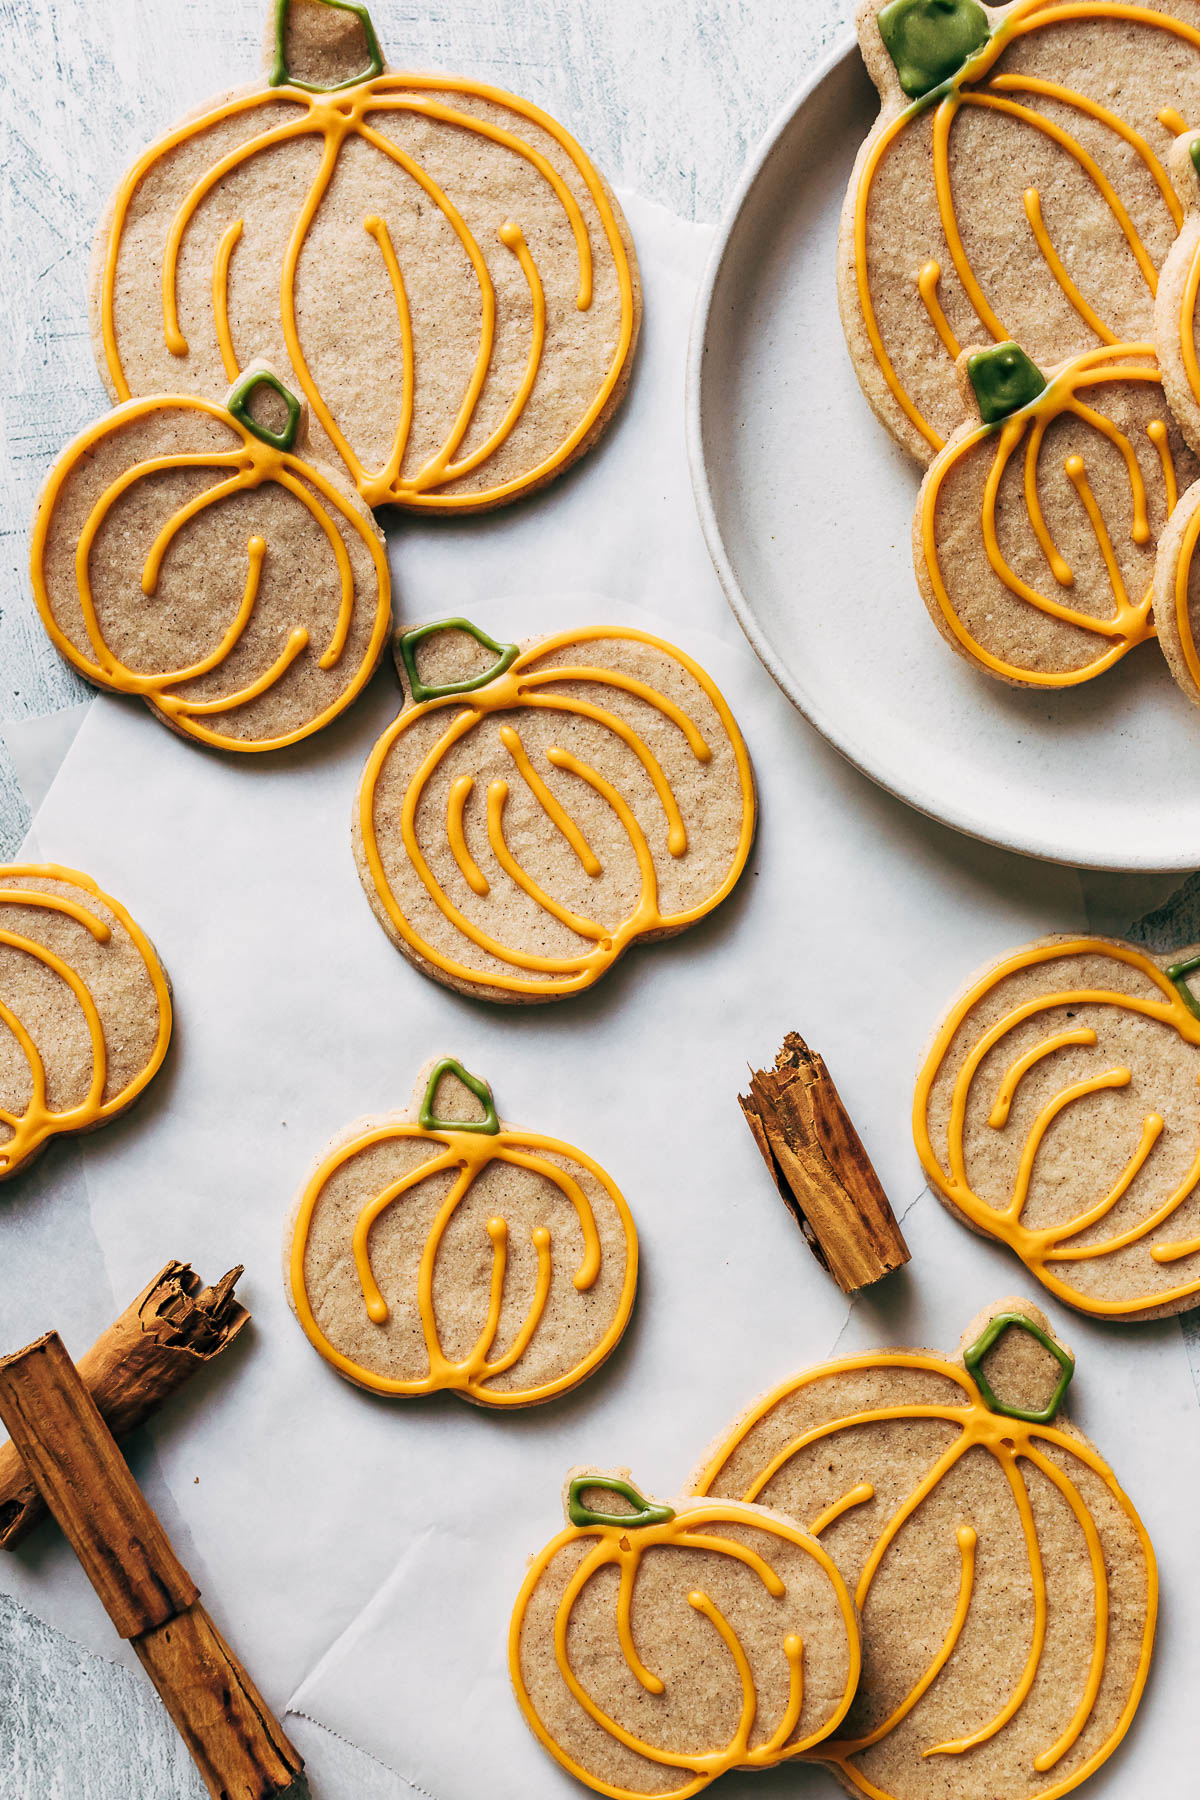 Pumpkin shaped cinnamon sugar cookies, iced, with cinnamon sticks.